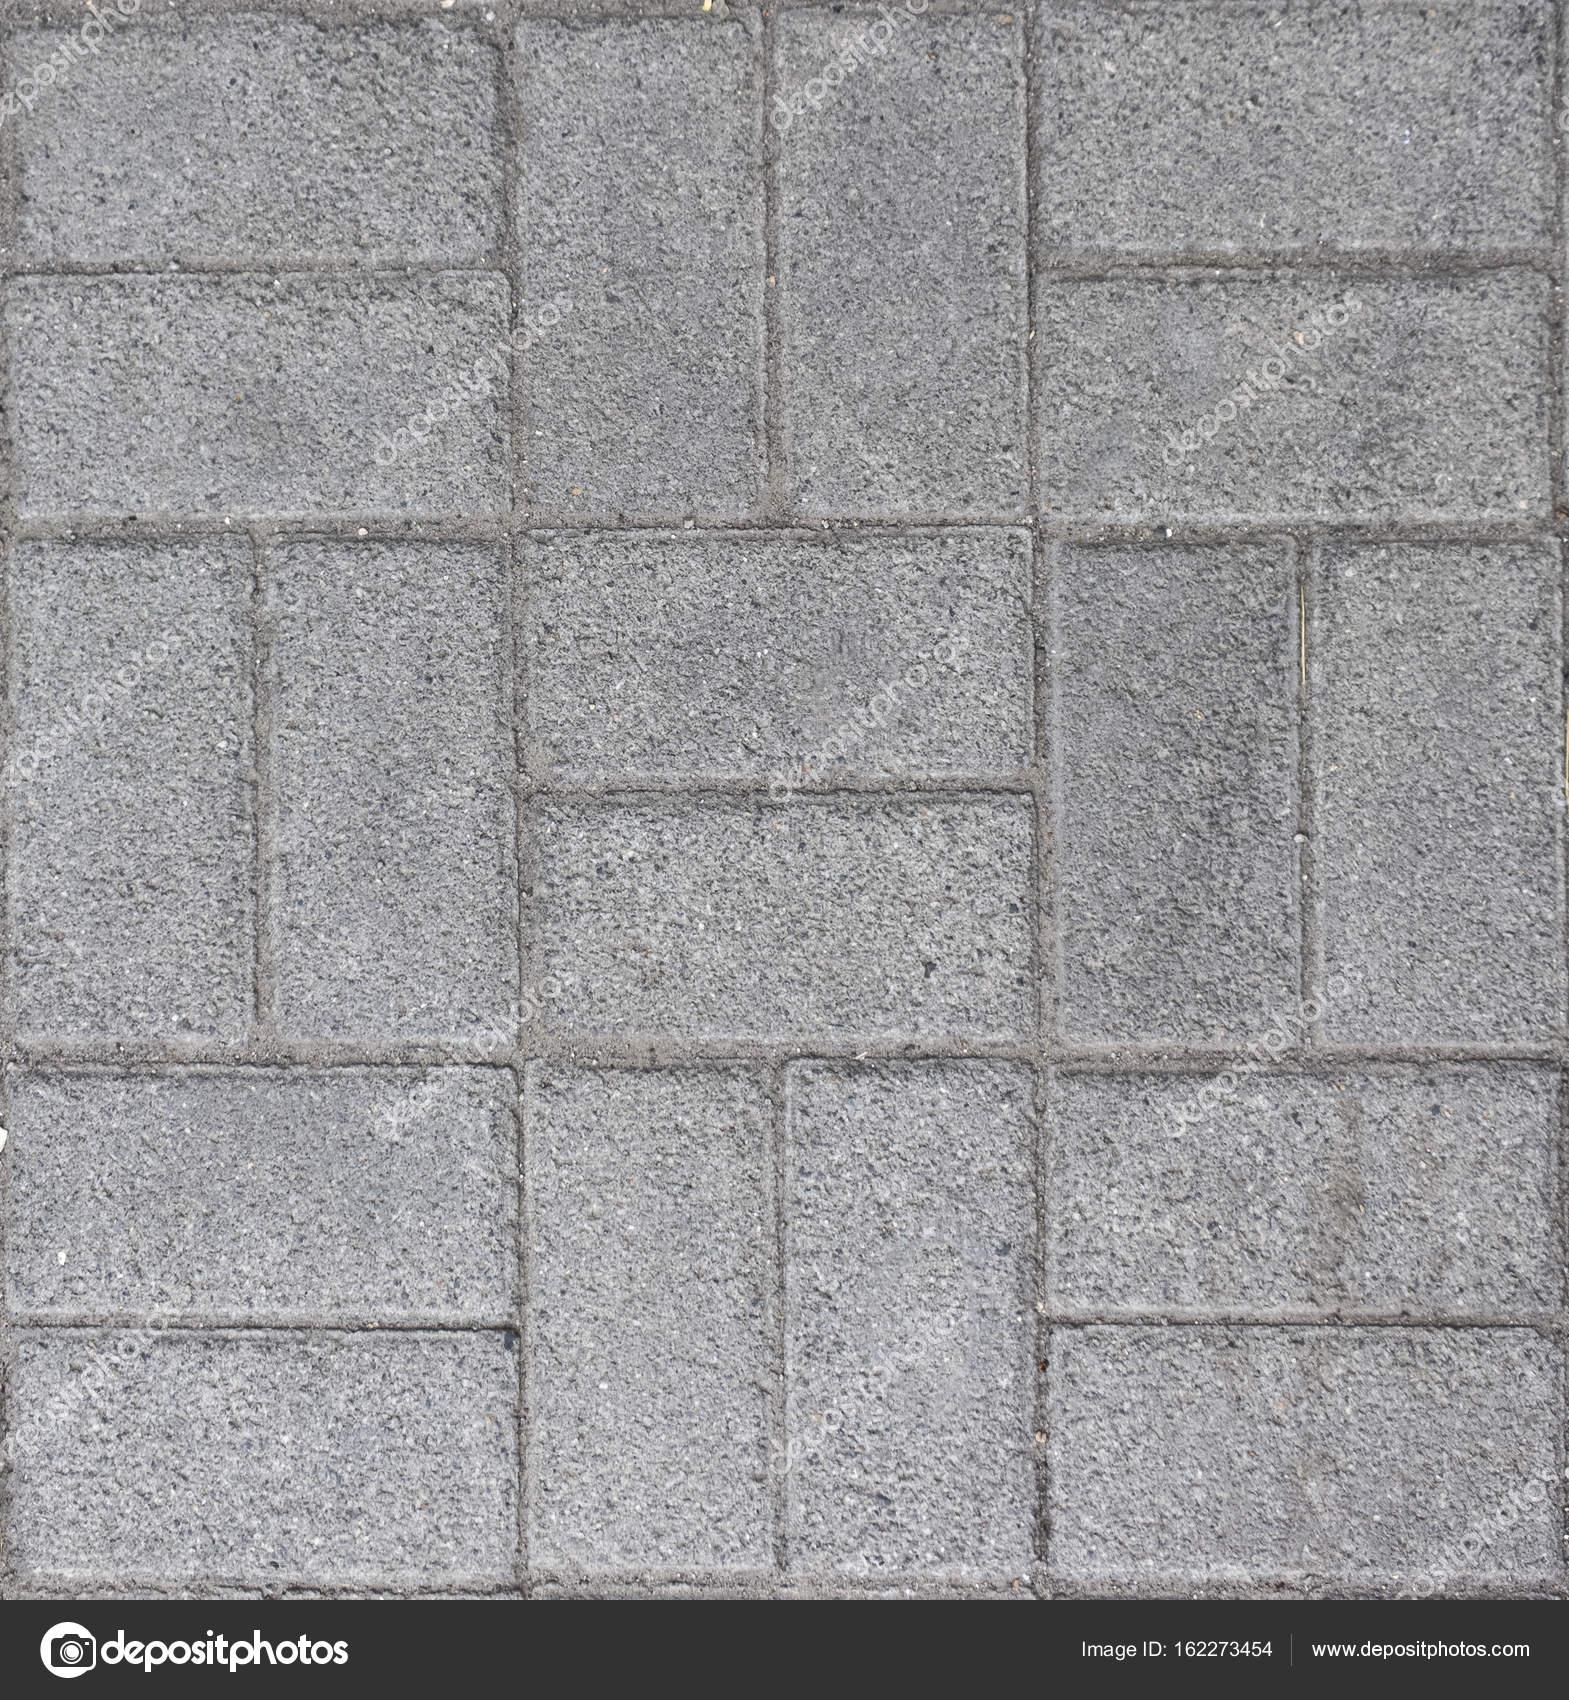 Sidewalk Tile Texture Bricks Background Floor Tiles Stock Photo